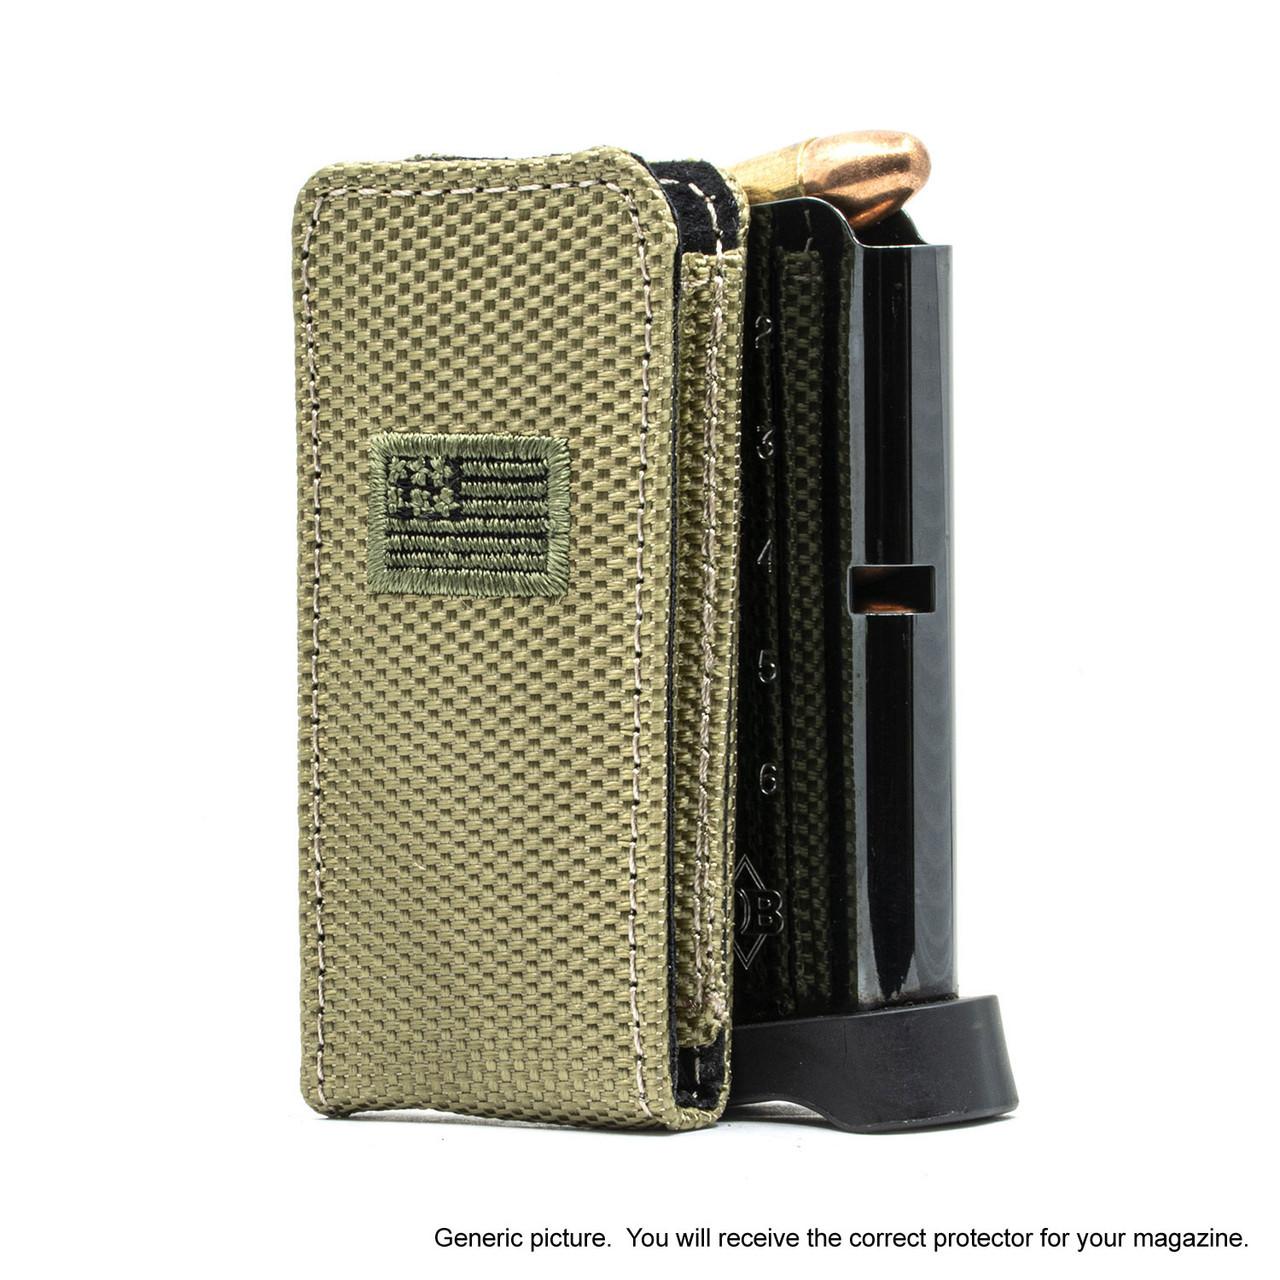 CZ 2075 Rami Green Canvas Flag Magazine Pocket Protector